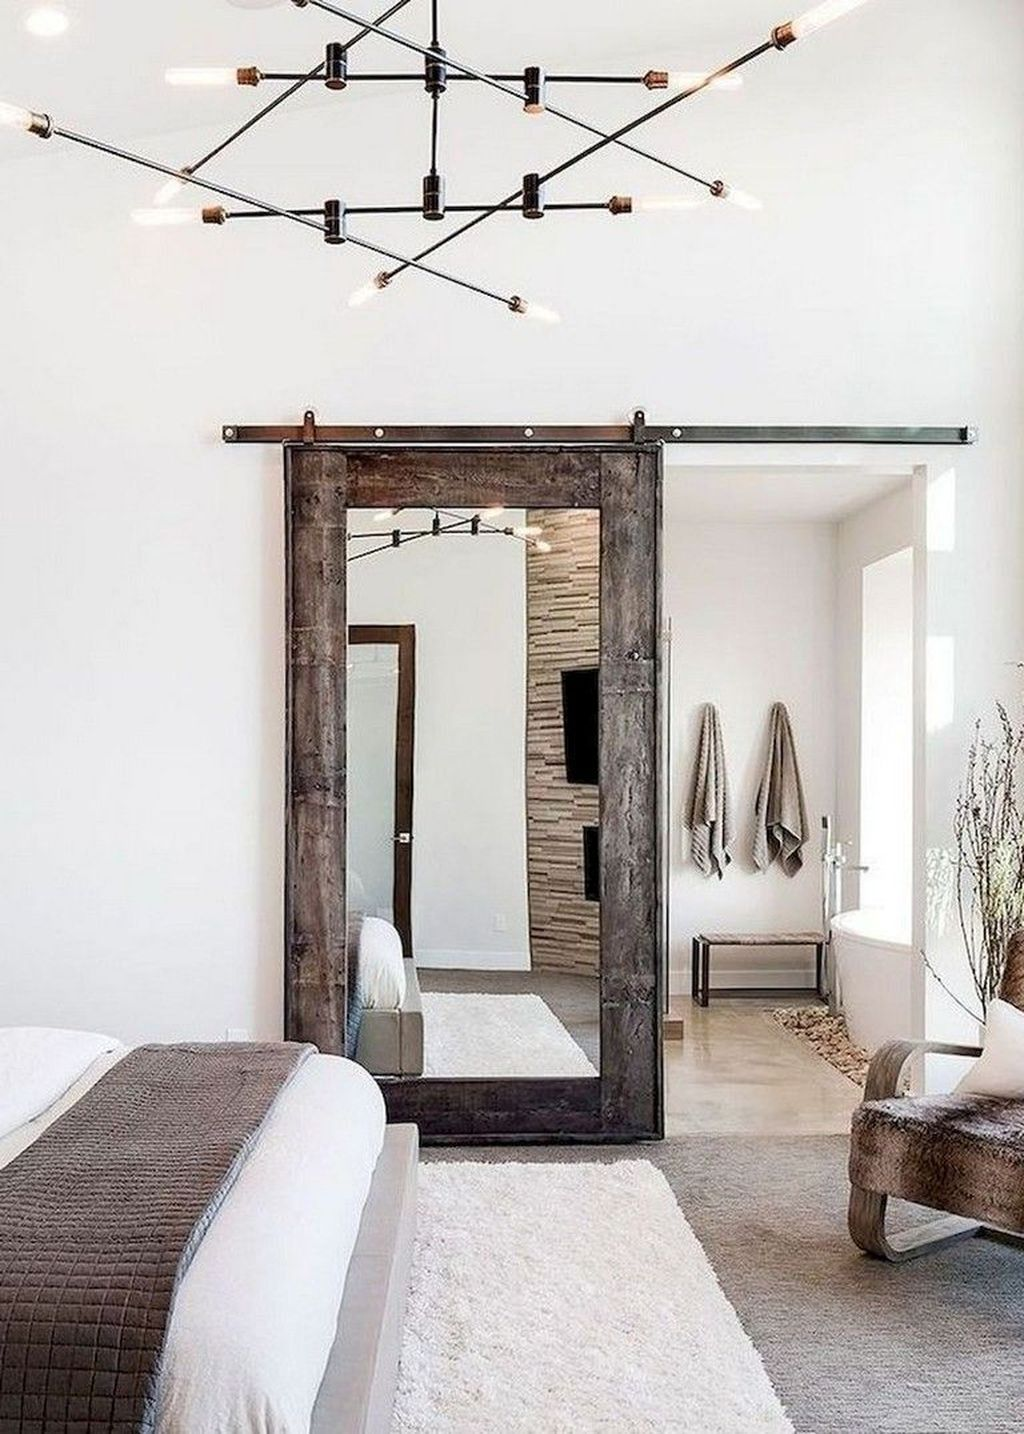 38 Fabulous Modern Farmhouse Bedroom Decorating Ideas Bedroom Decorating Fabulo In 2020 Farmhouse Bedroom Decor Modern Rustic Master Bedroom Rustic Master Bedroom